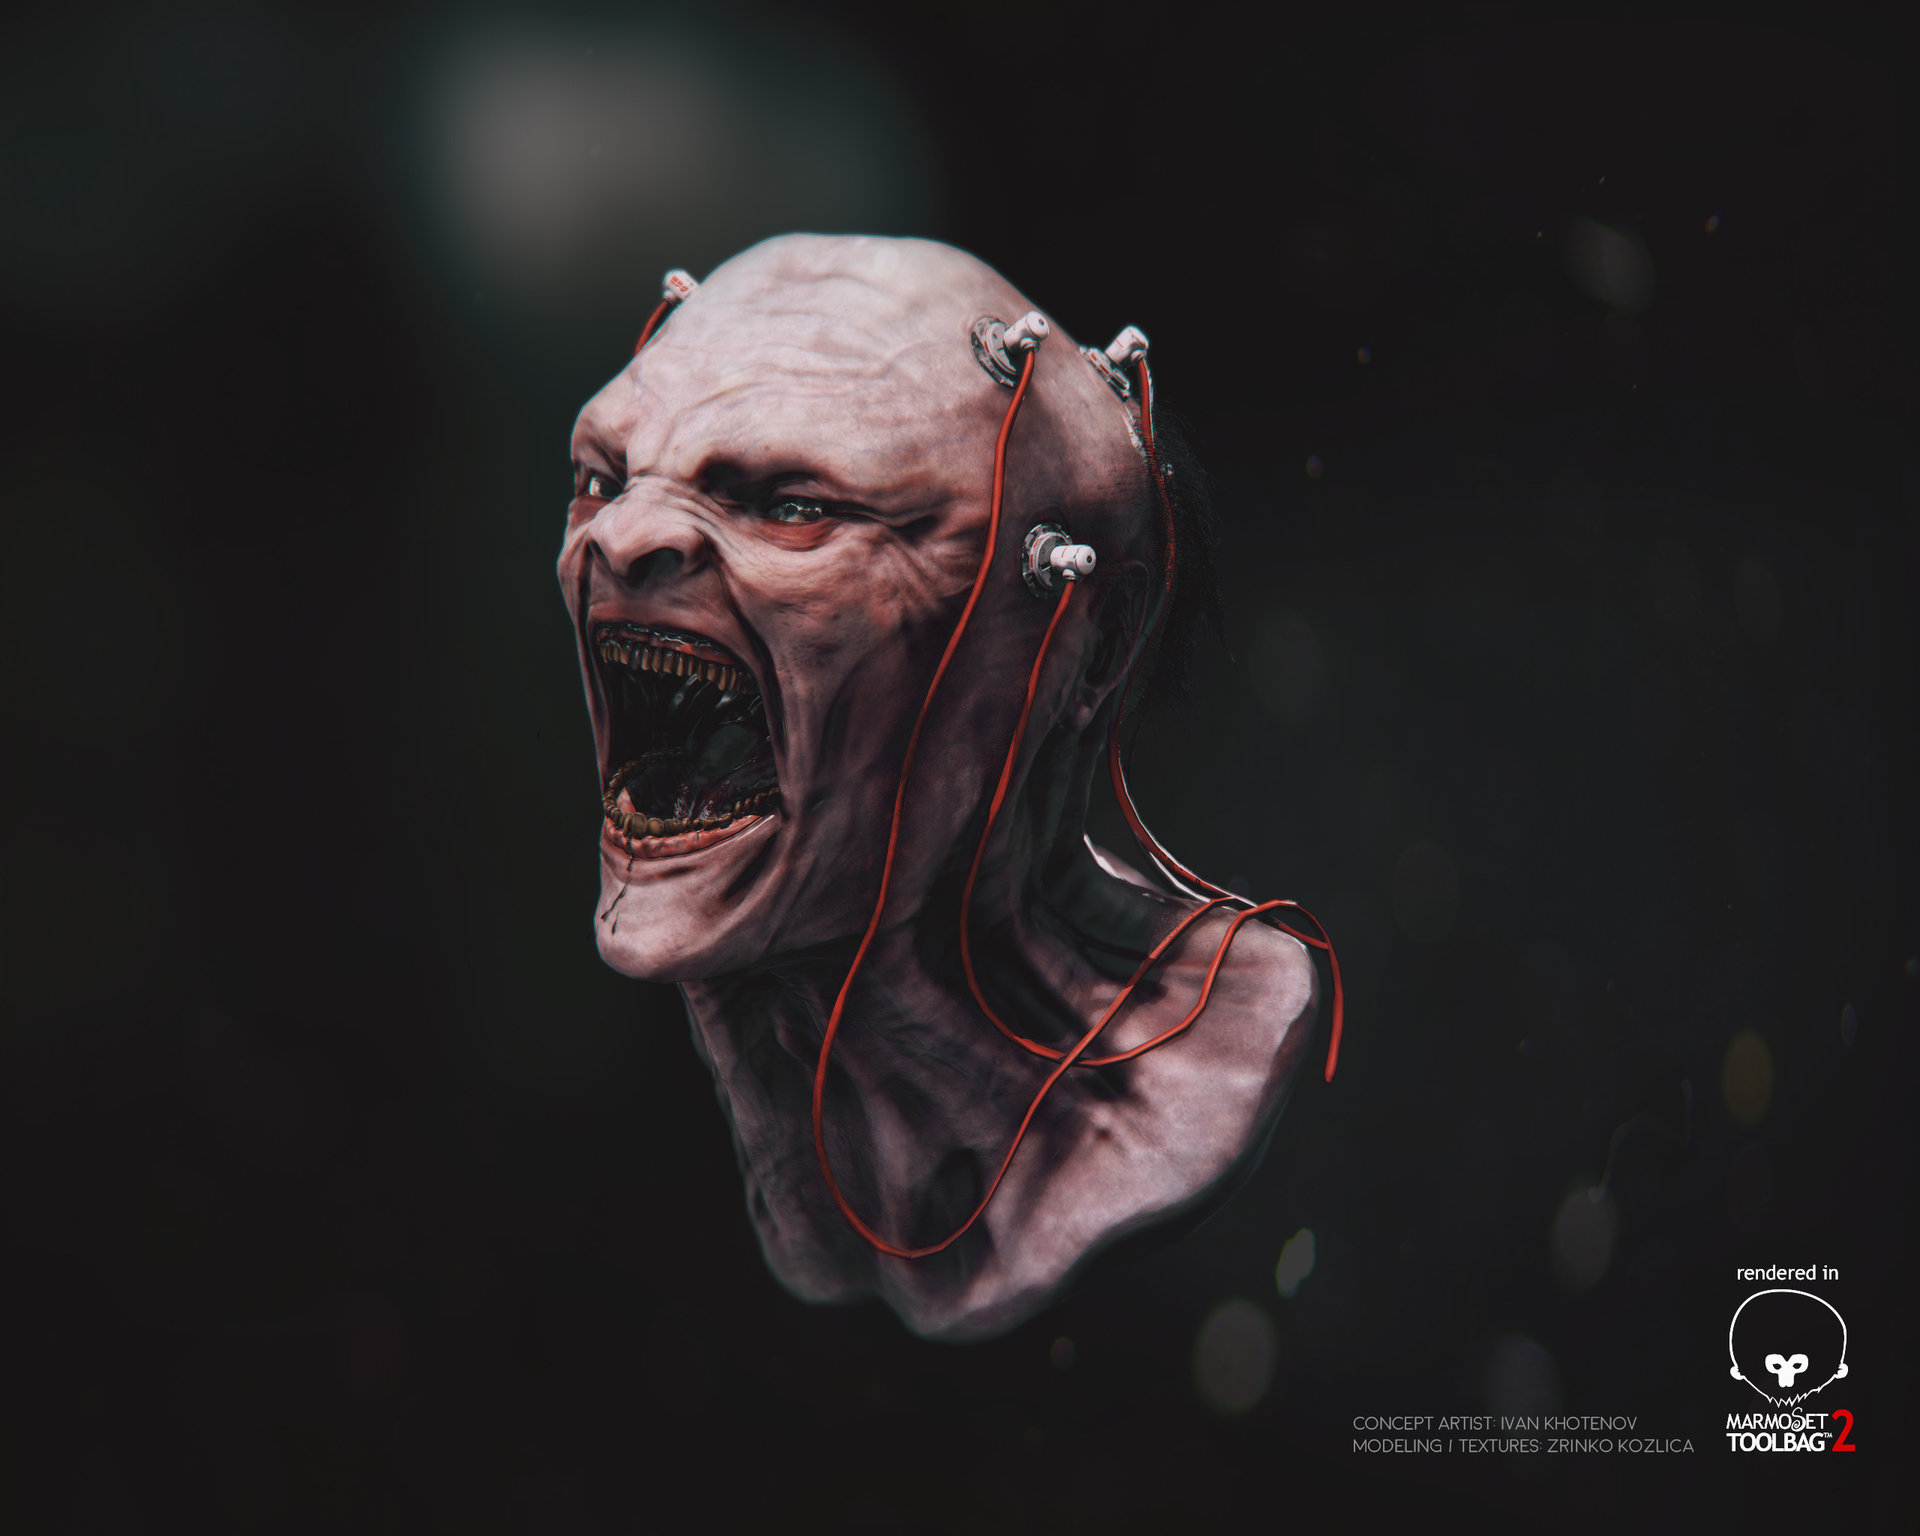 zrinko-kozlica-creature-1.jpg?1438653987